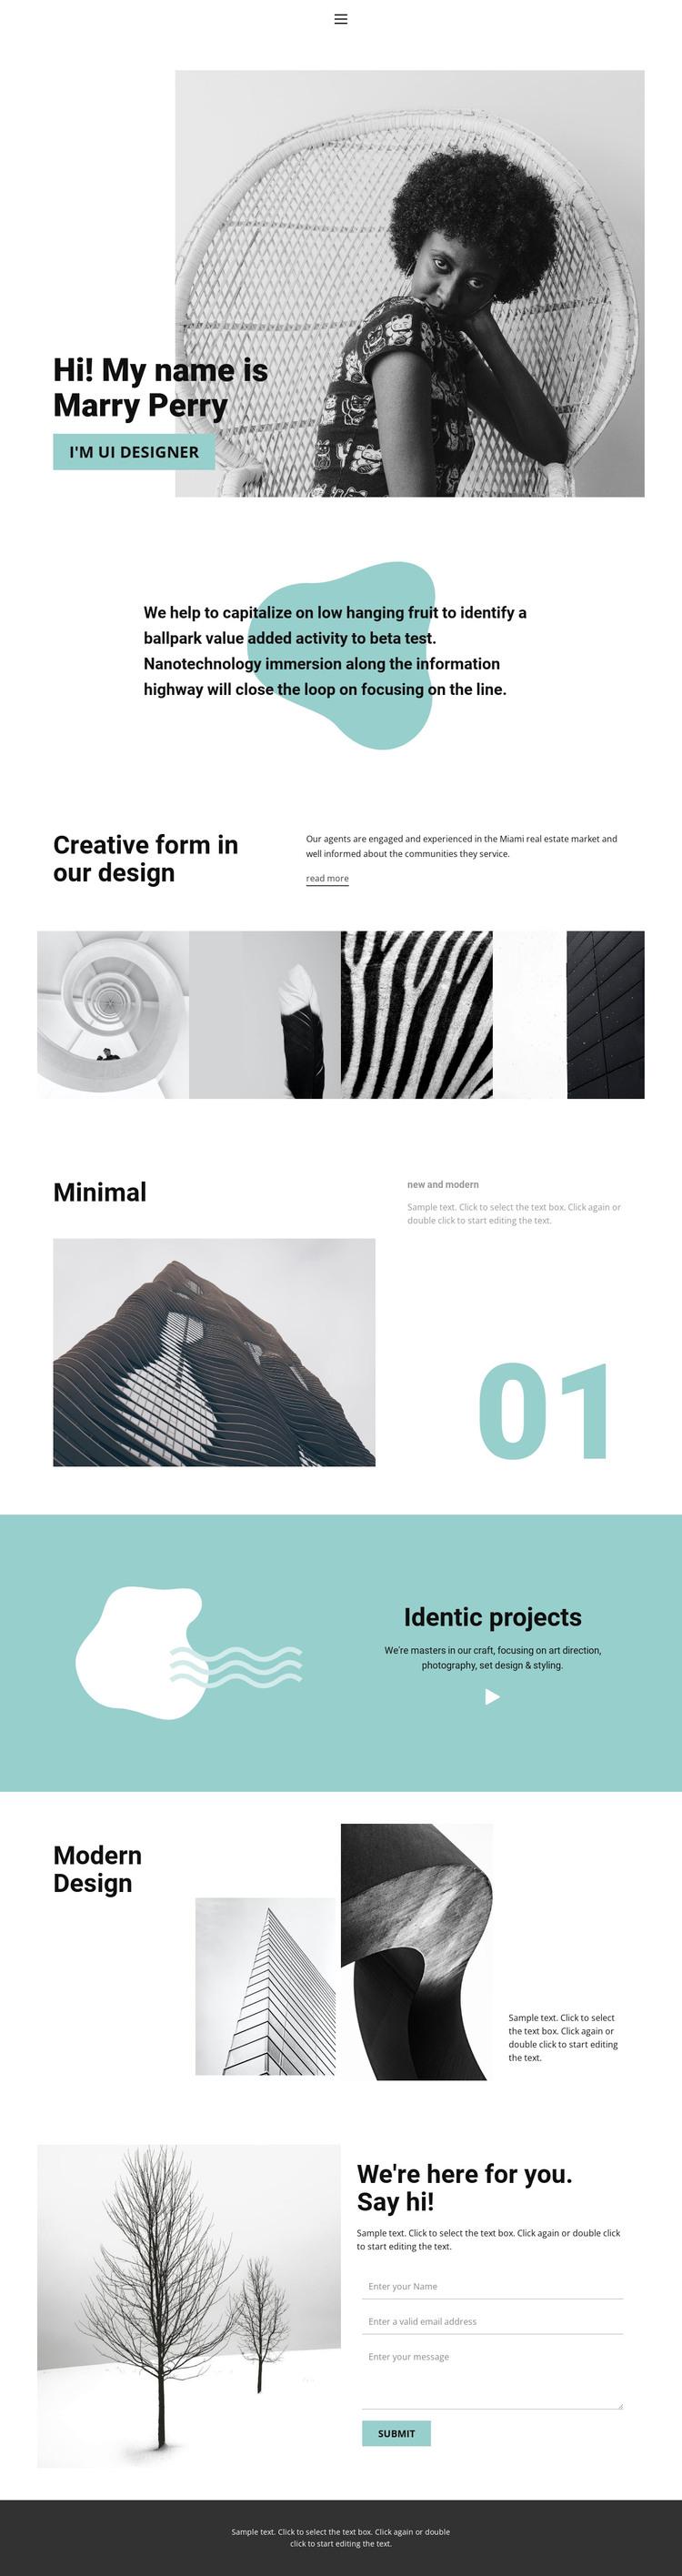 Web design from our studio WordPress Theme